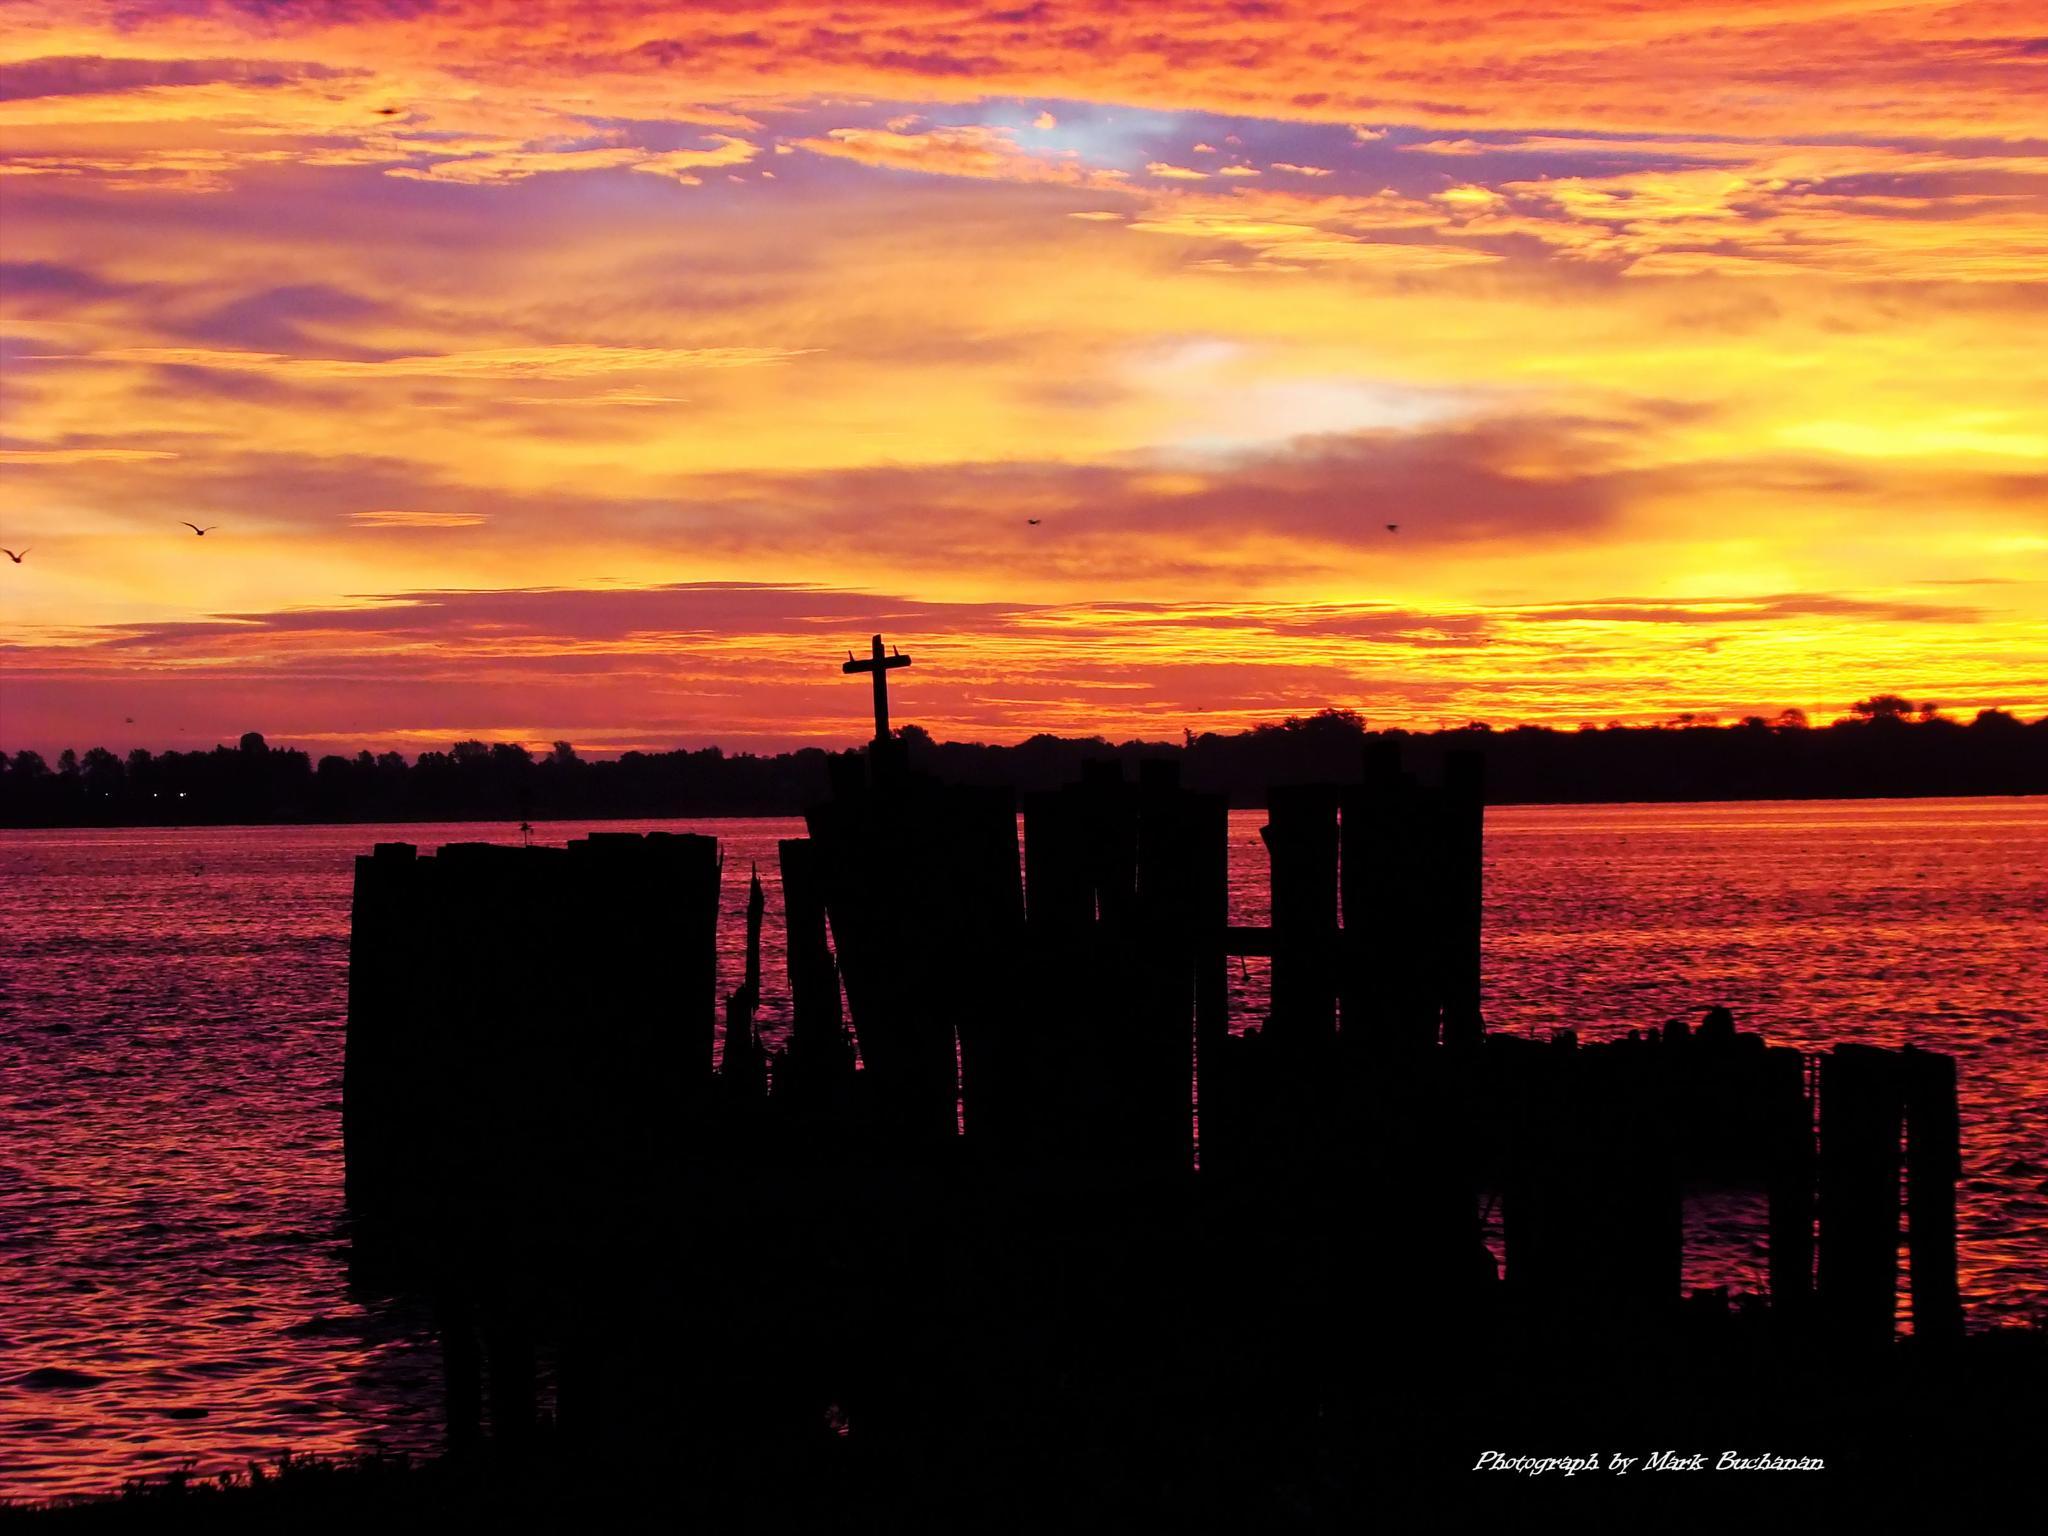 Contrasts of sunrise by Mark Buchanan